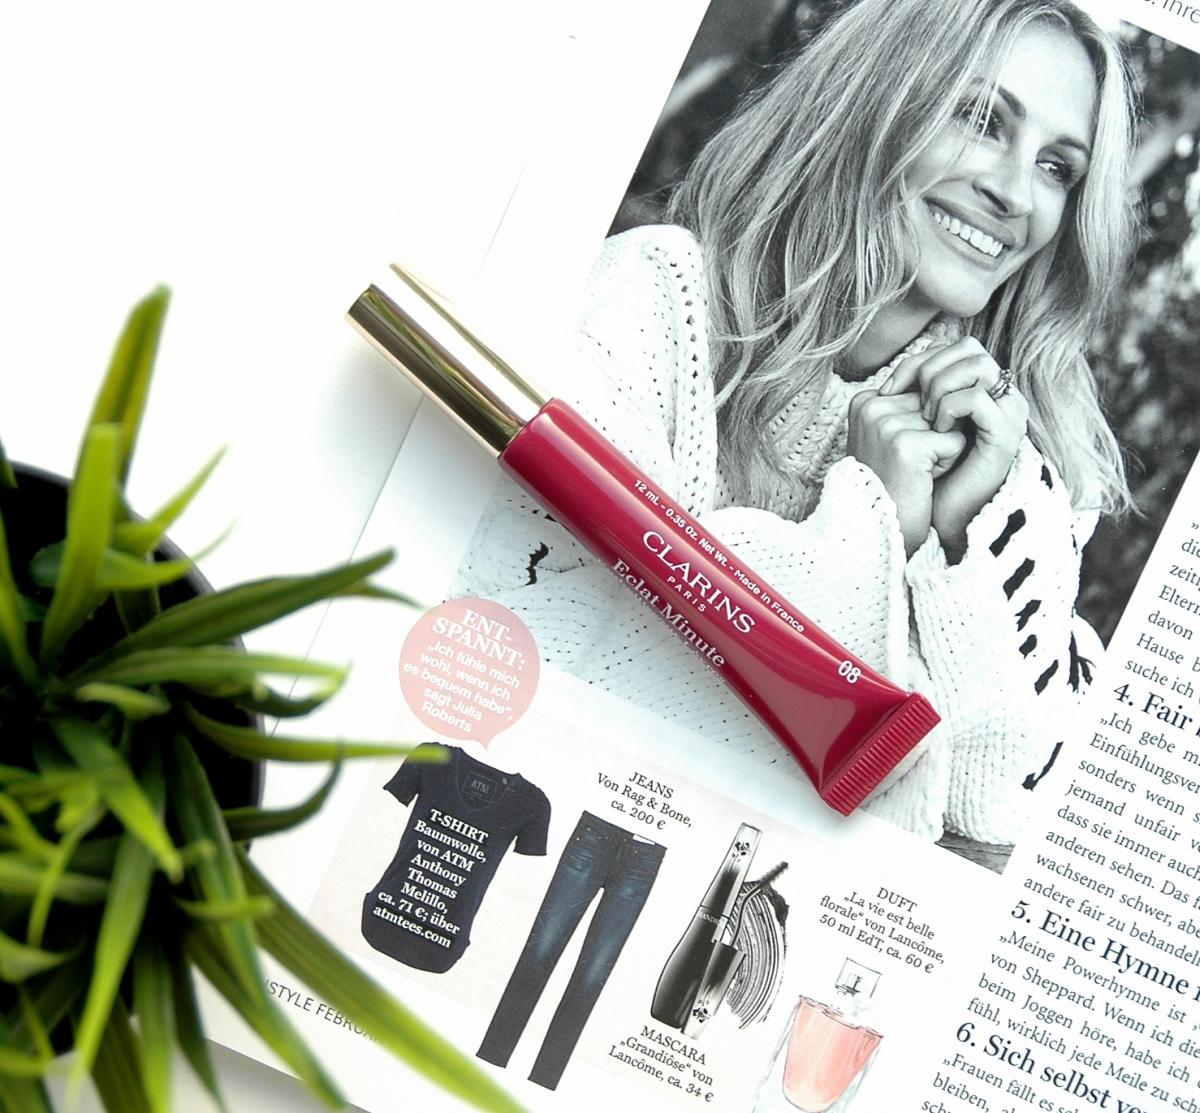 Clarins Eclat Minute Embellisseur Lèvres Plum Shimmer